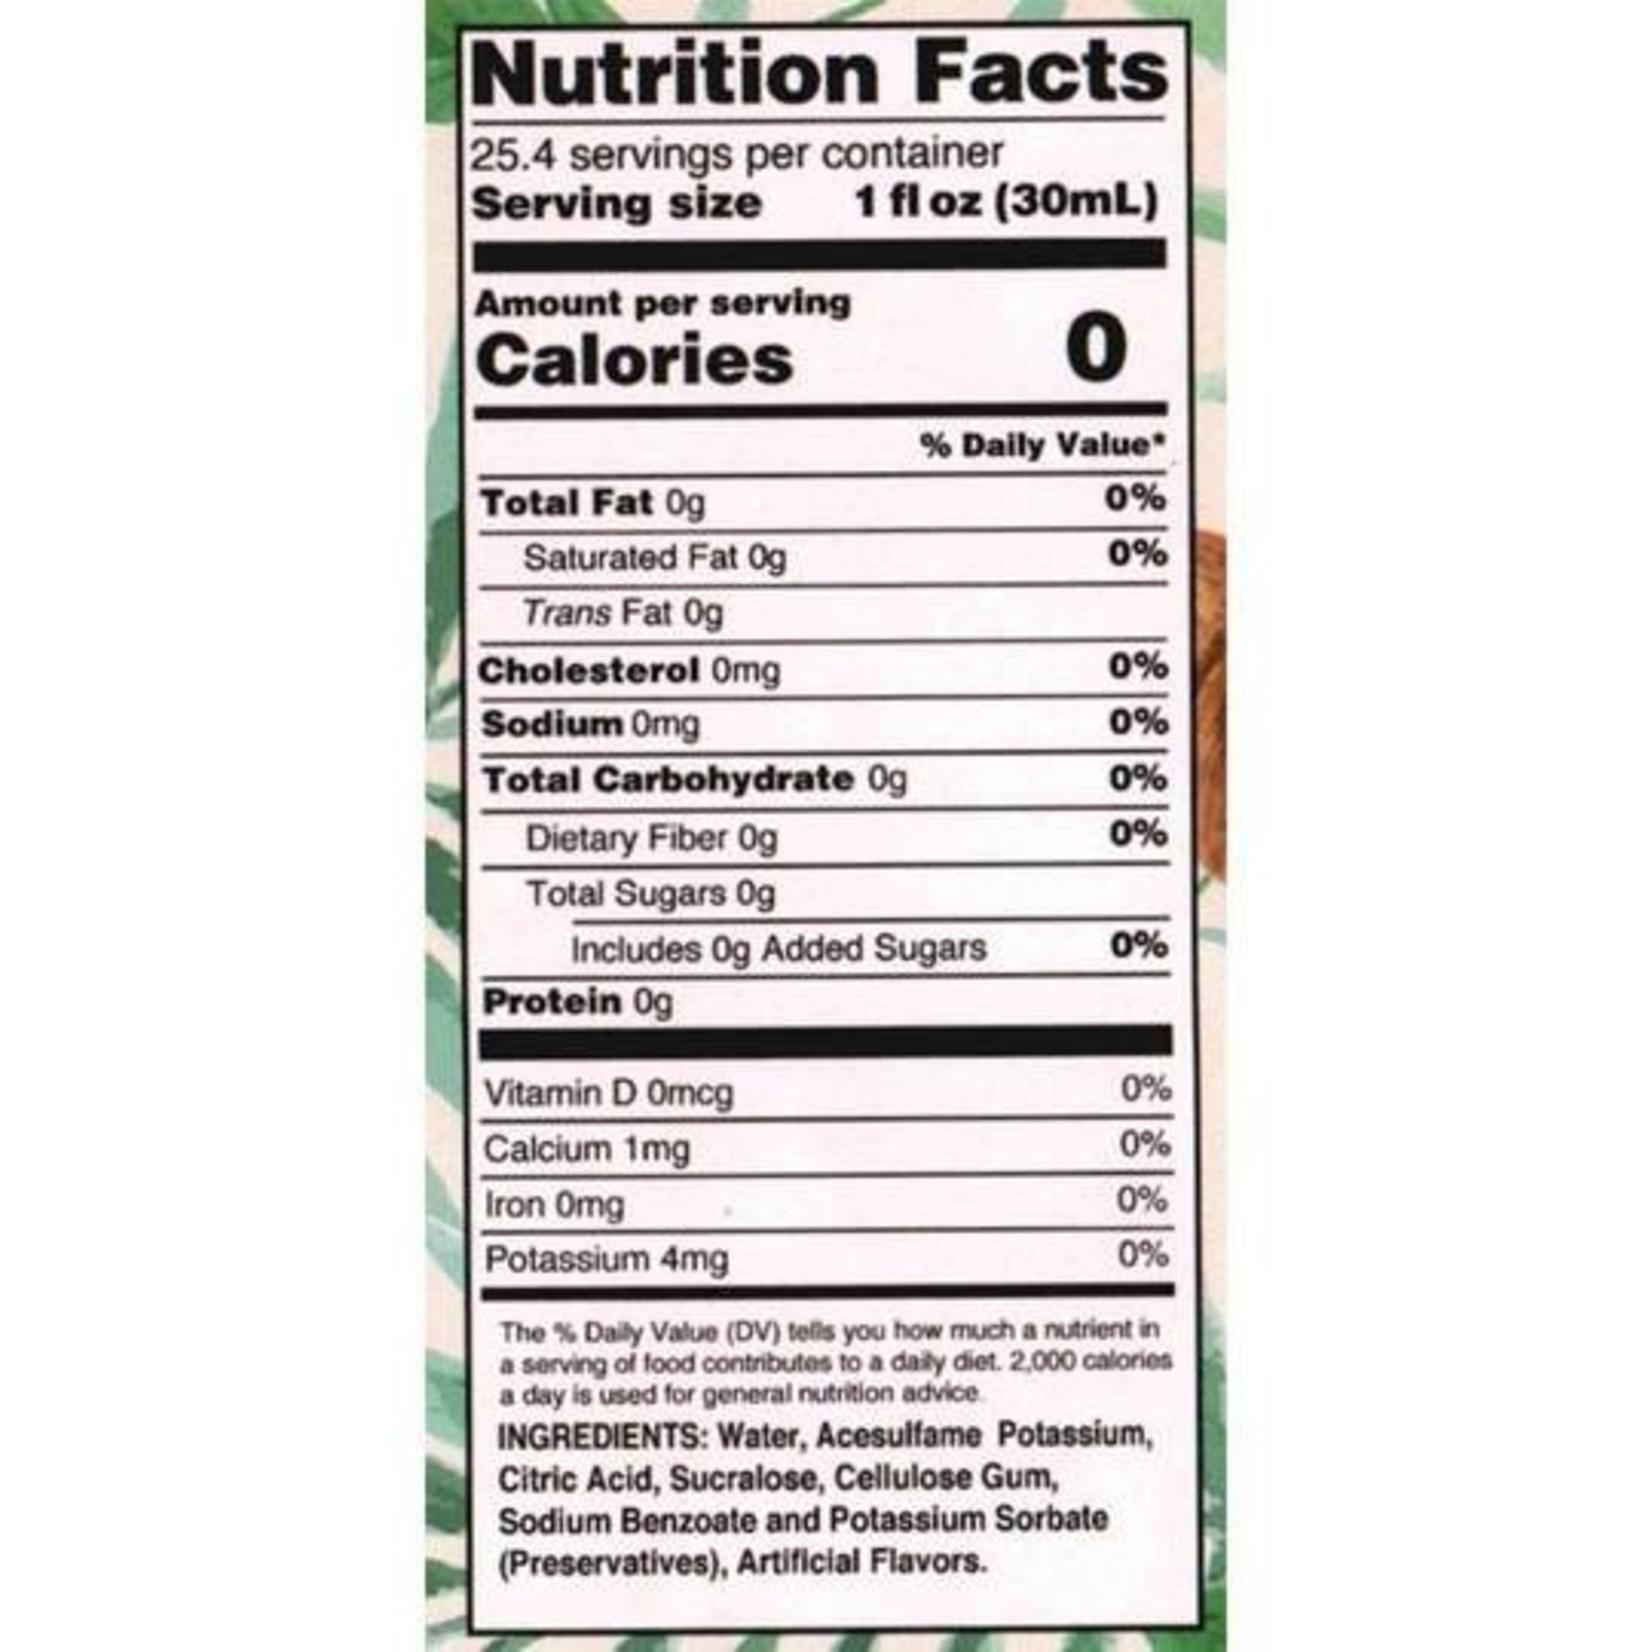 Jordan's Skinny Mixes Sugar Free Coconut Syrup